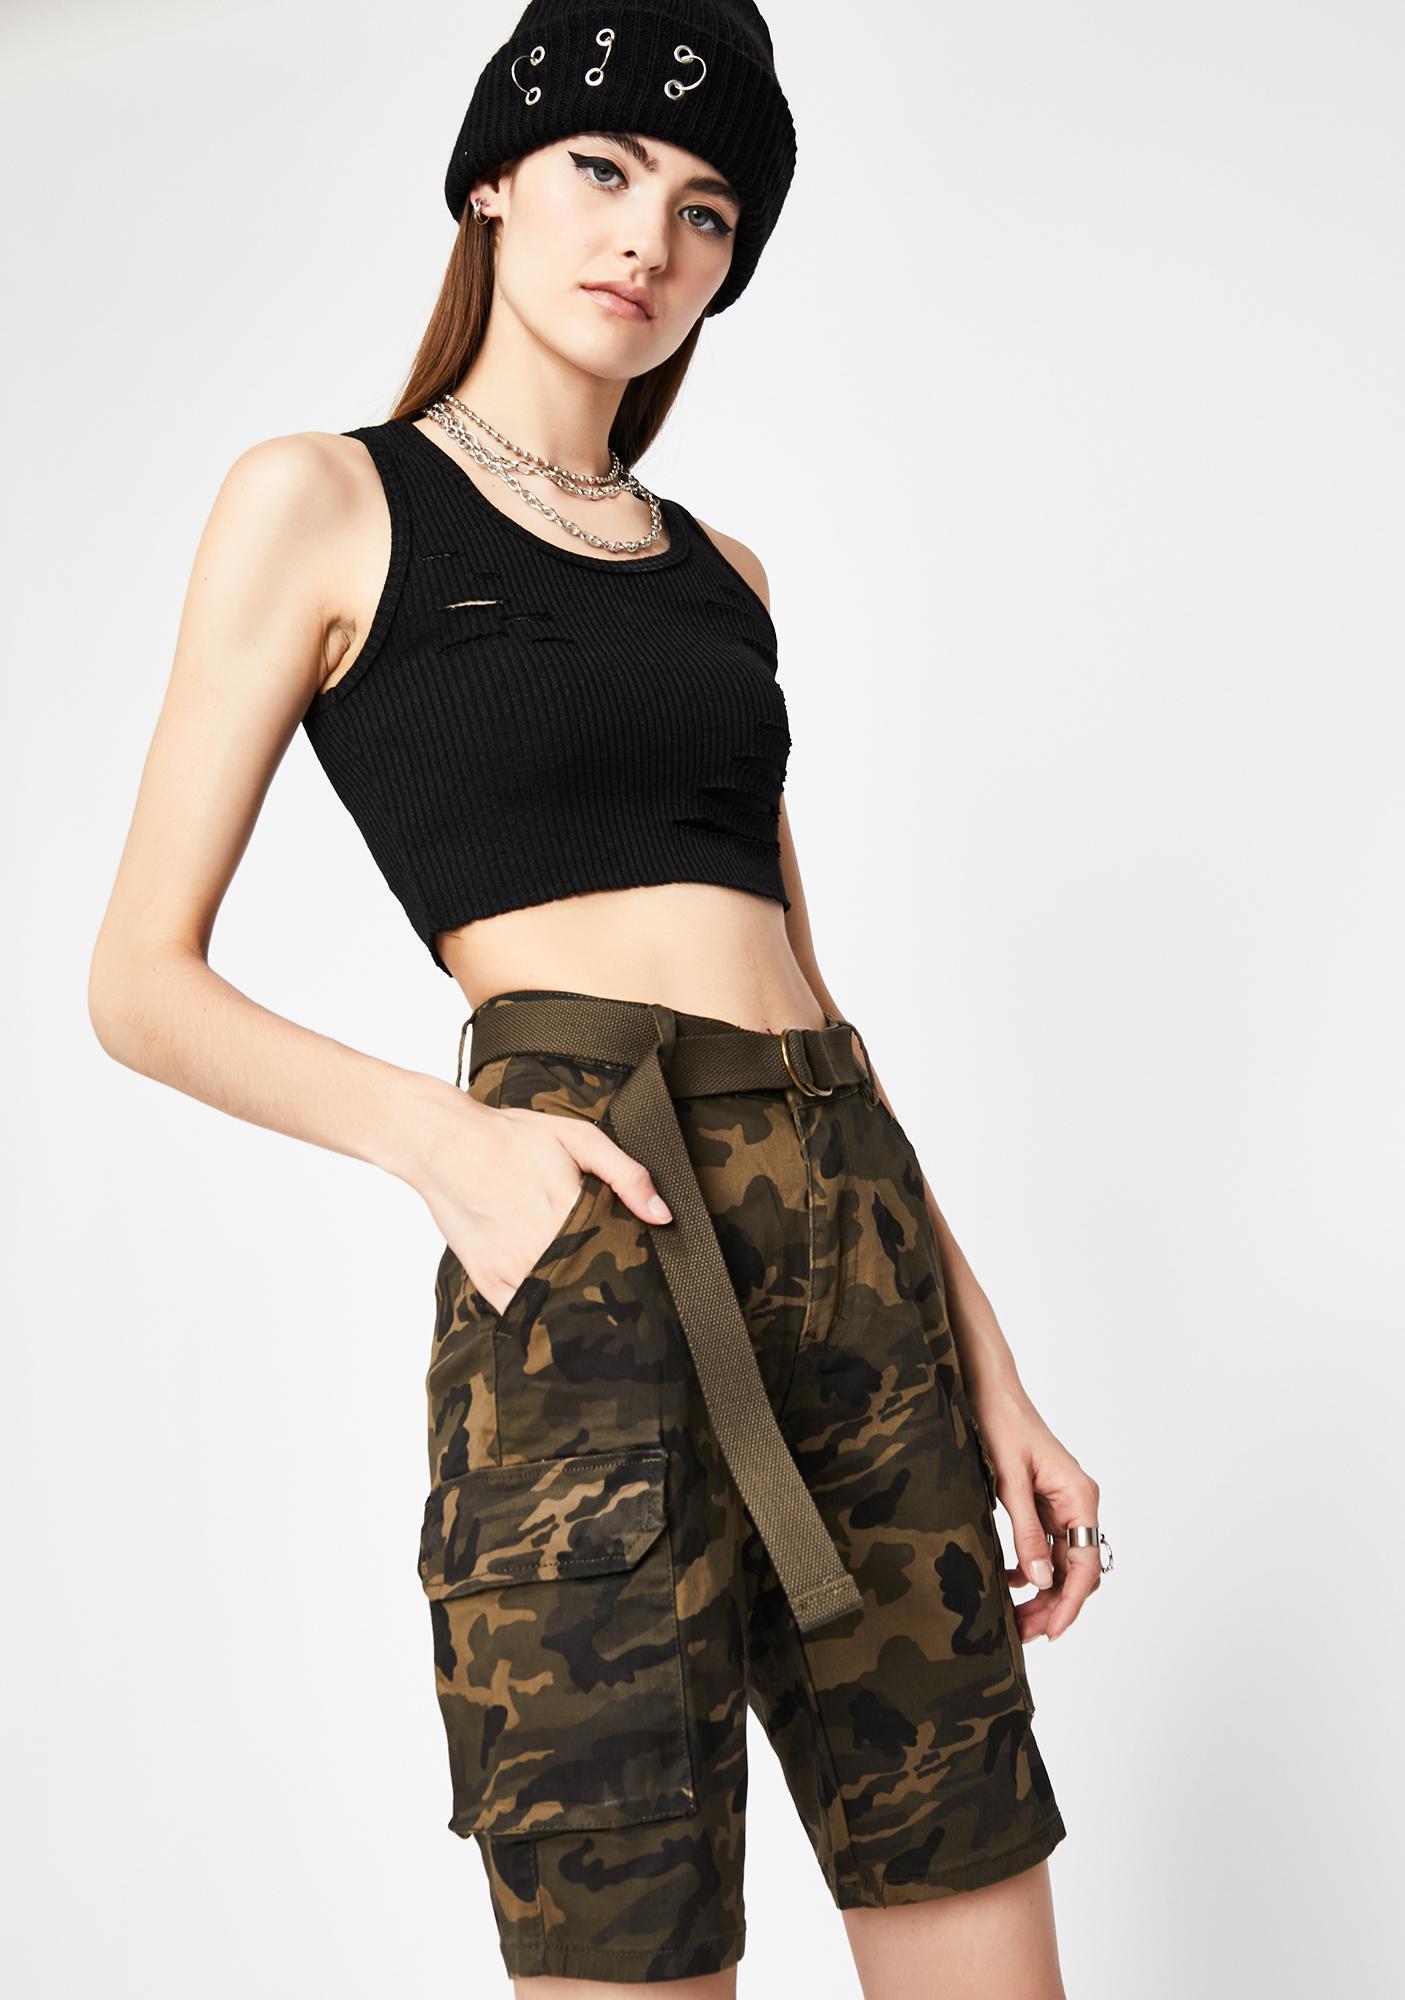 U Know The Drill Camo Shorts